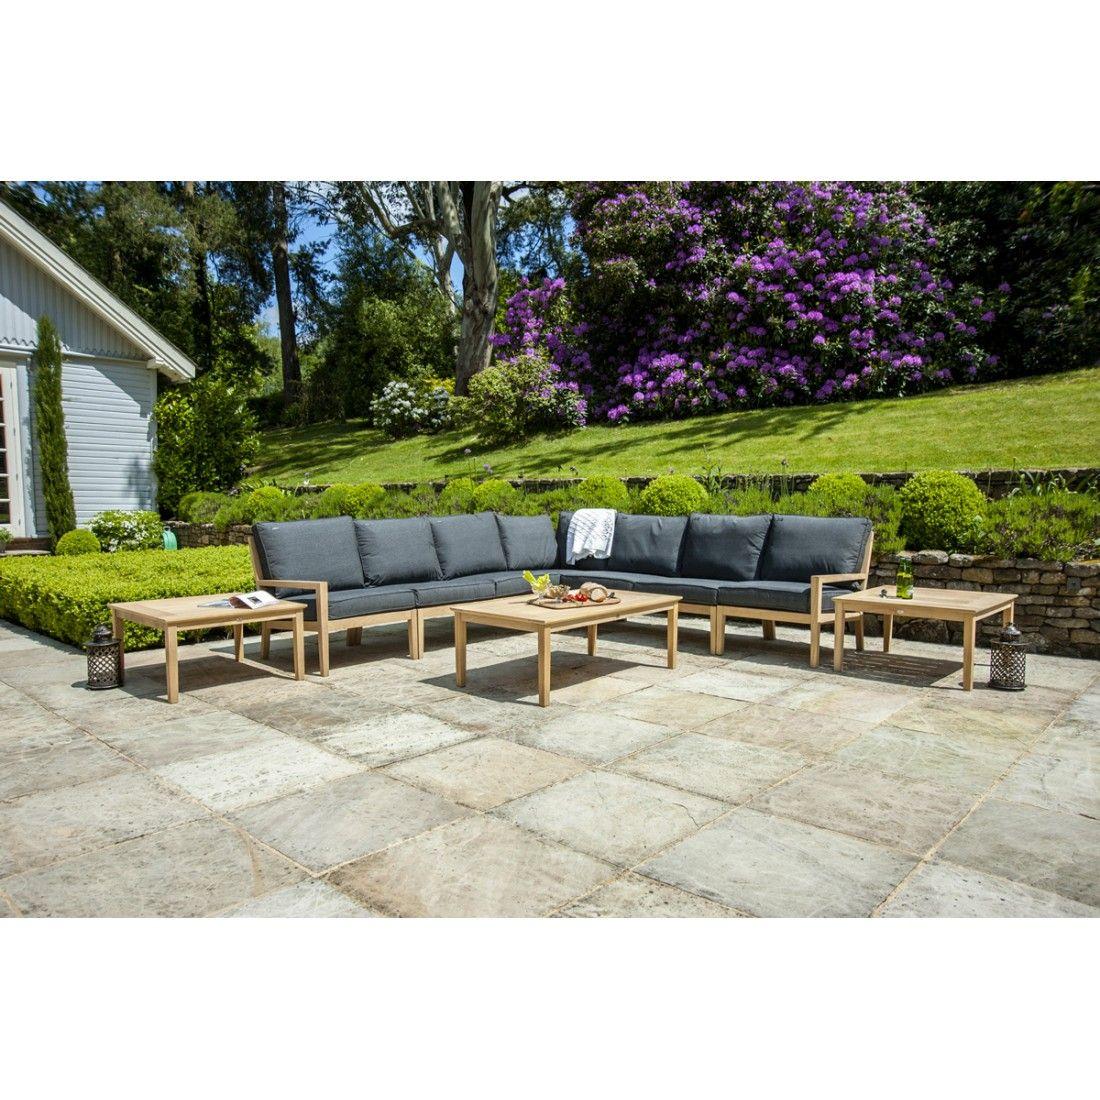 Salon de jardin en bois de roble Tivoli, module droit